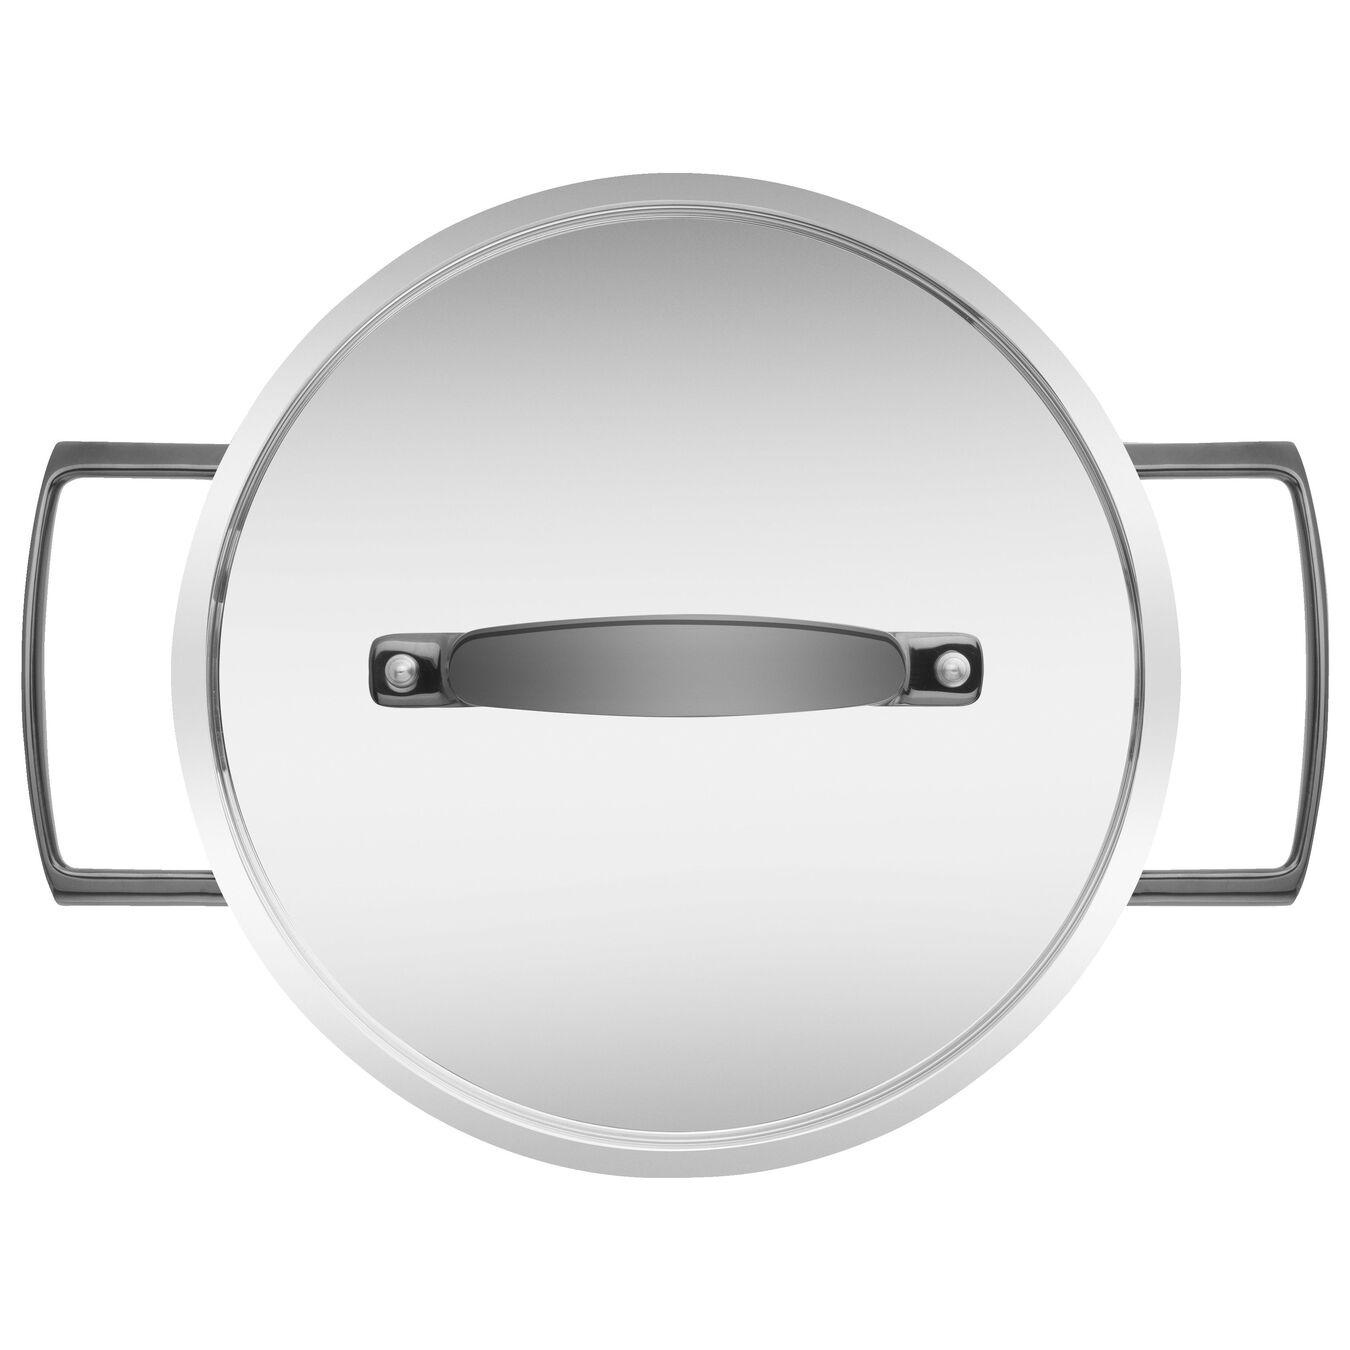 5 Piece Cookware set,,large 2